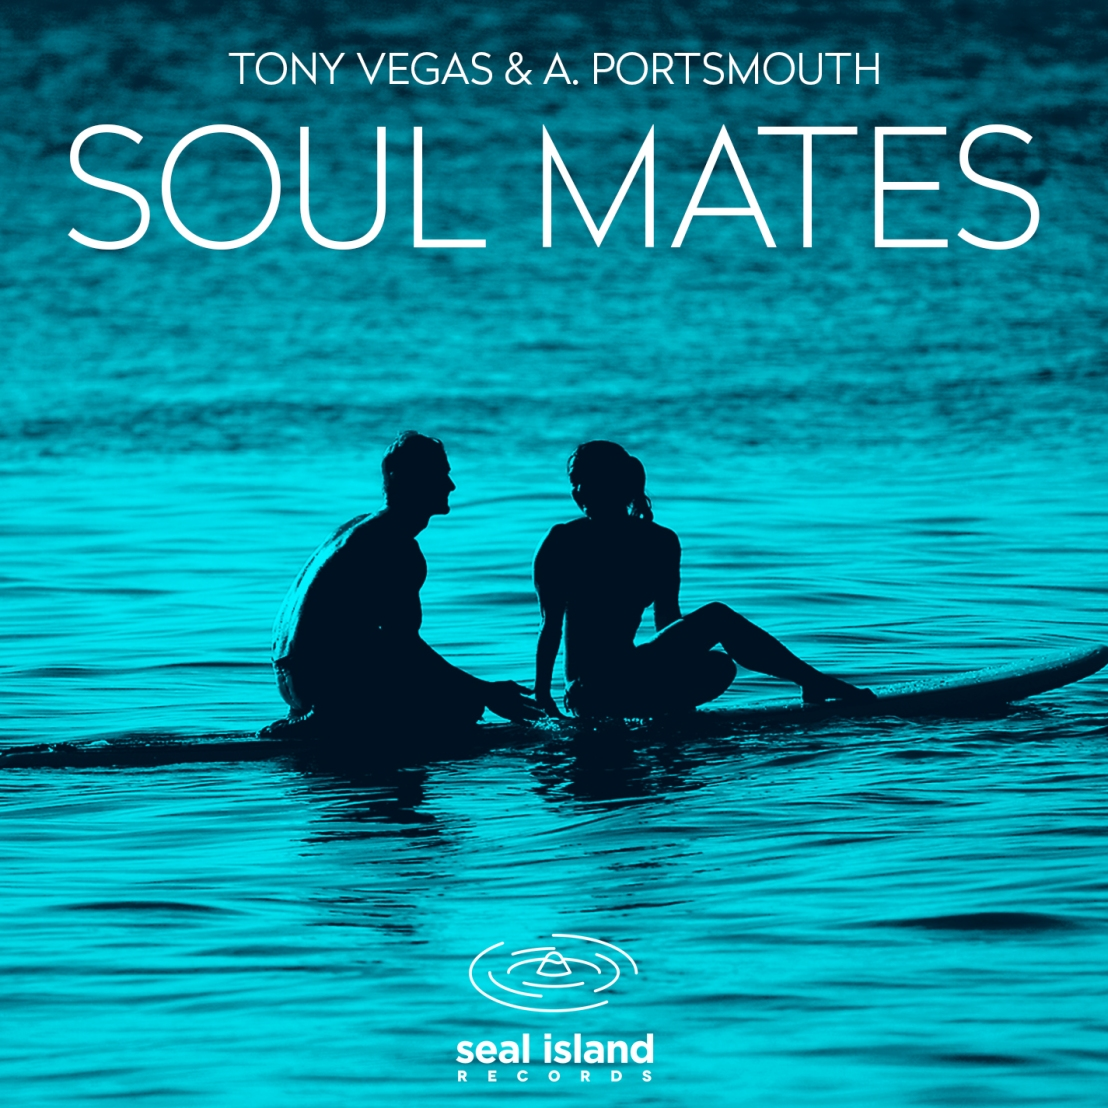 Tony Vegas & A. Portsmouth – SoulMates